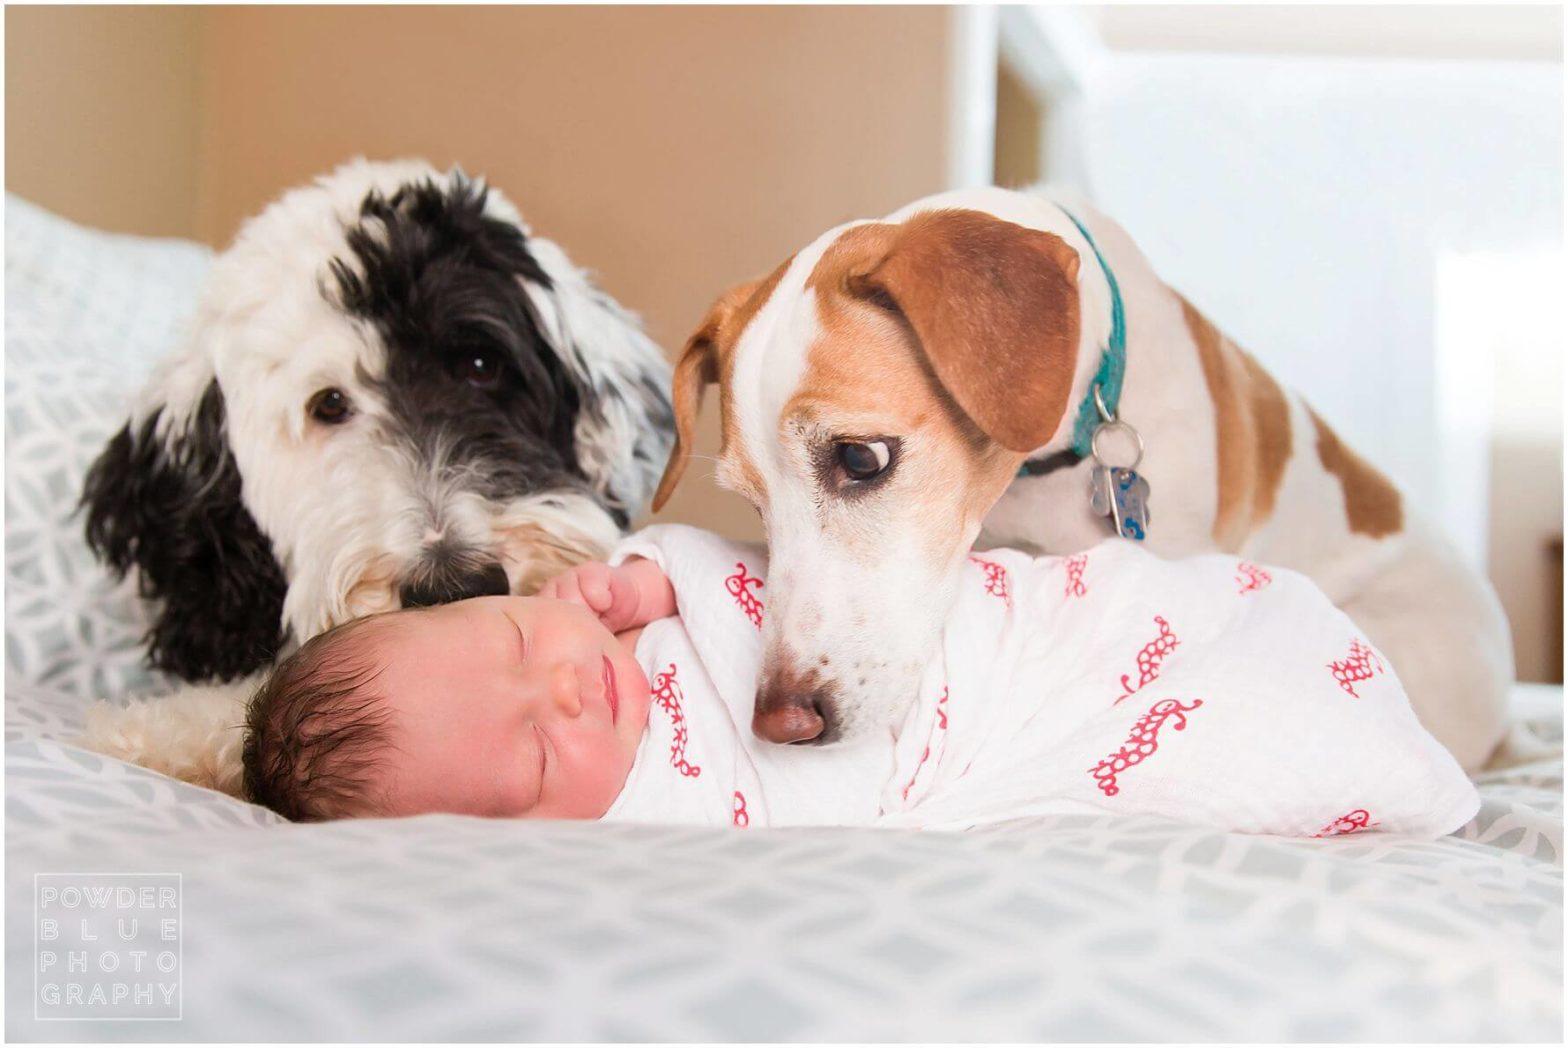 pittsburgh lifestyle newborn photographer in home newborn baby session pink baby girl